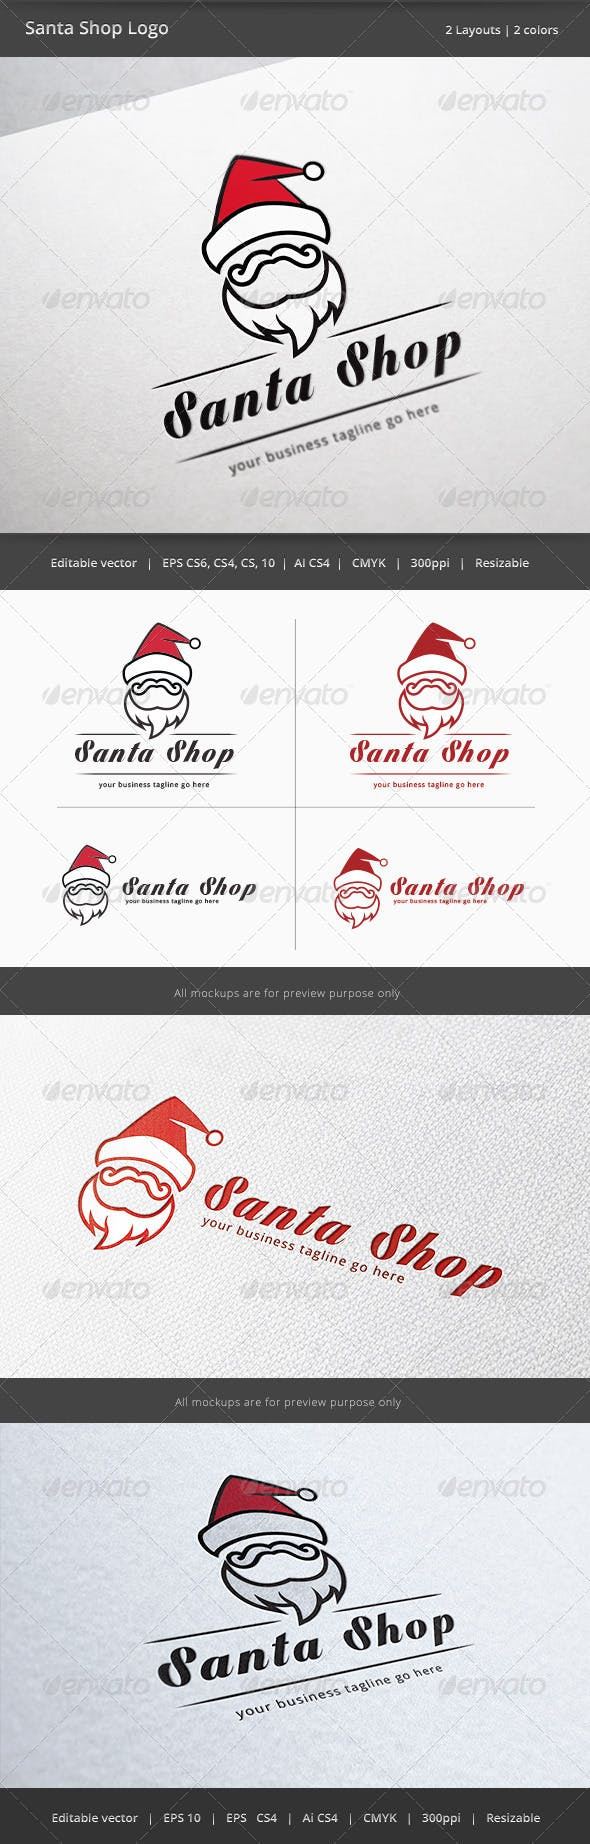 Дизайн логотипа Деда Мороза для визитки